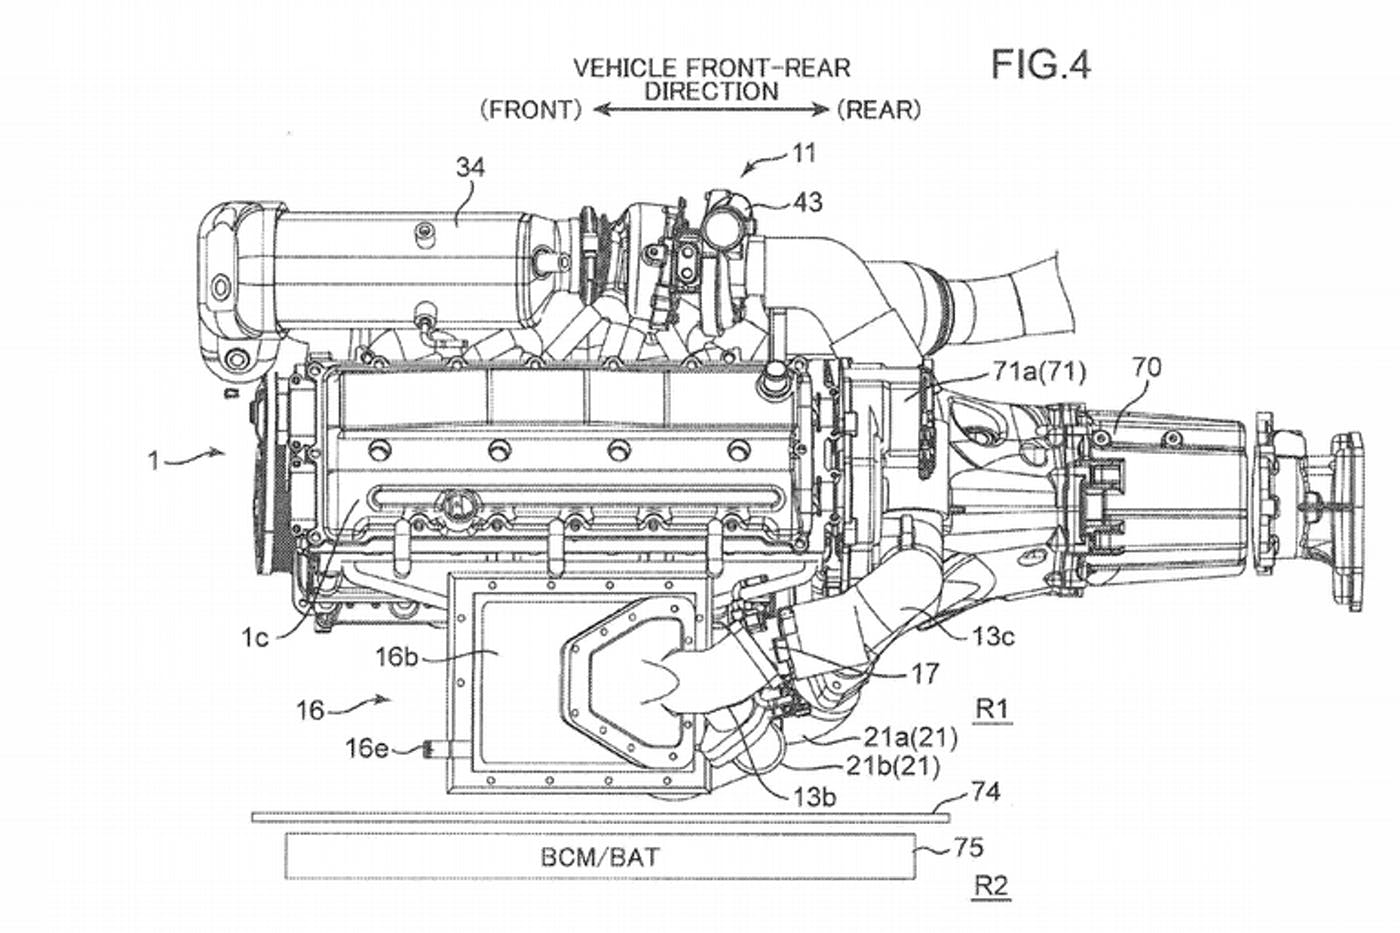 I4 Engine Diagram - Pljx Wiring Diagram -  subaruoutback.yadarimu1.jeanjaures37.fr   I4 Engine Diagram      Wiring Diagram Resource